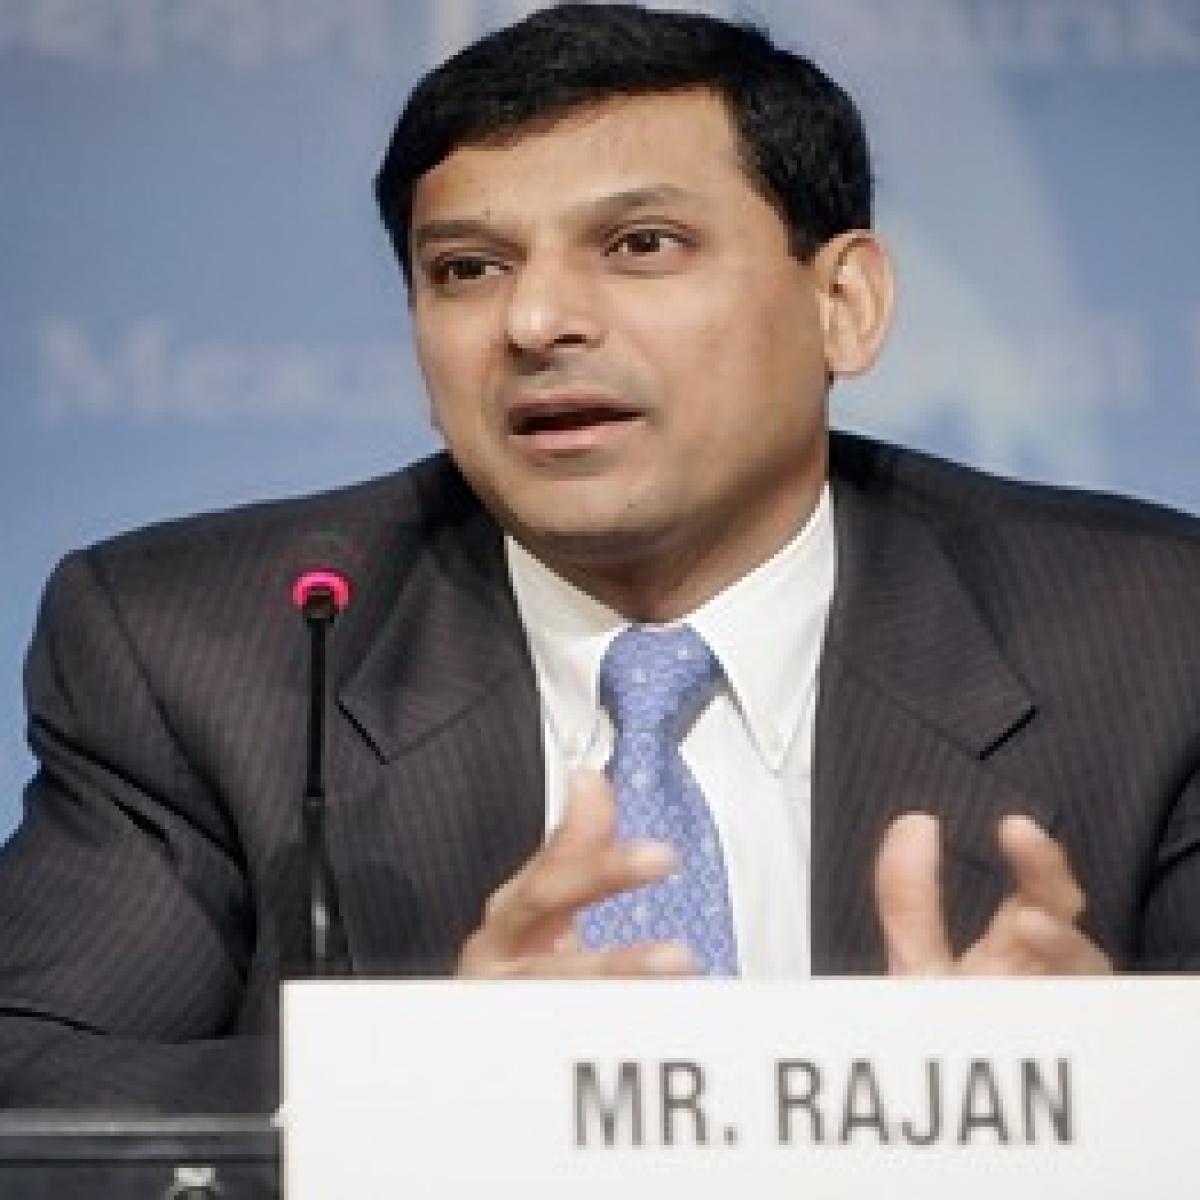 India needs low tariffs to draw supply chains and create jobs, says Raghuram Rajan